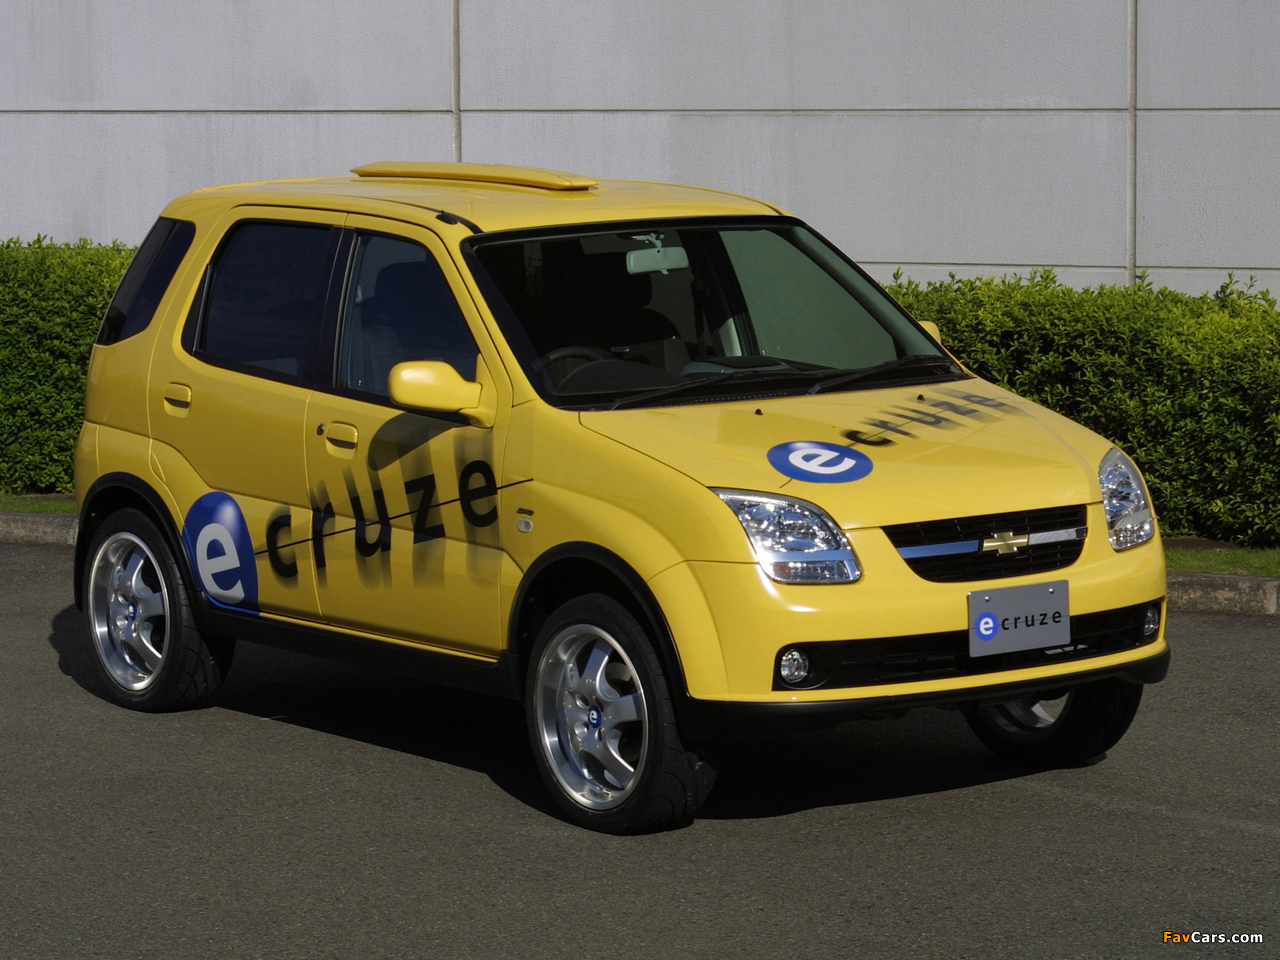 Chevrolet e-Cruze Concept 2001 pictures (1280 x 960)